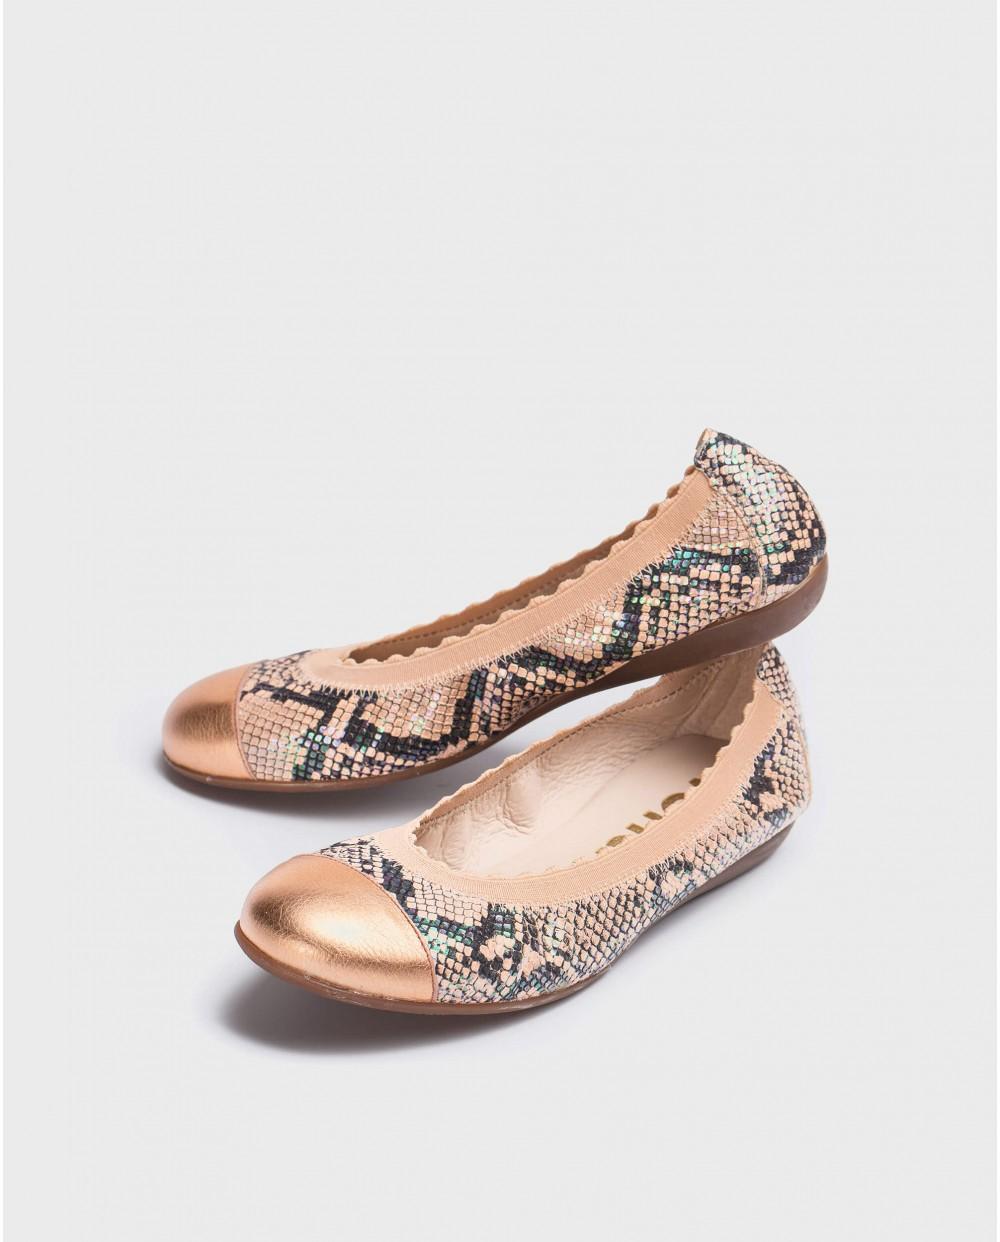 Wonders-Flat Shoes-Elastic ballerina